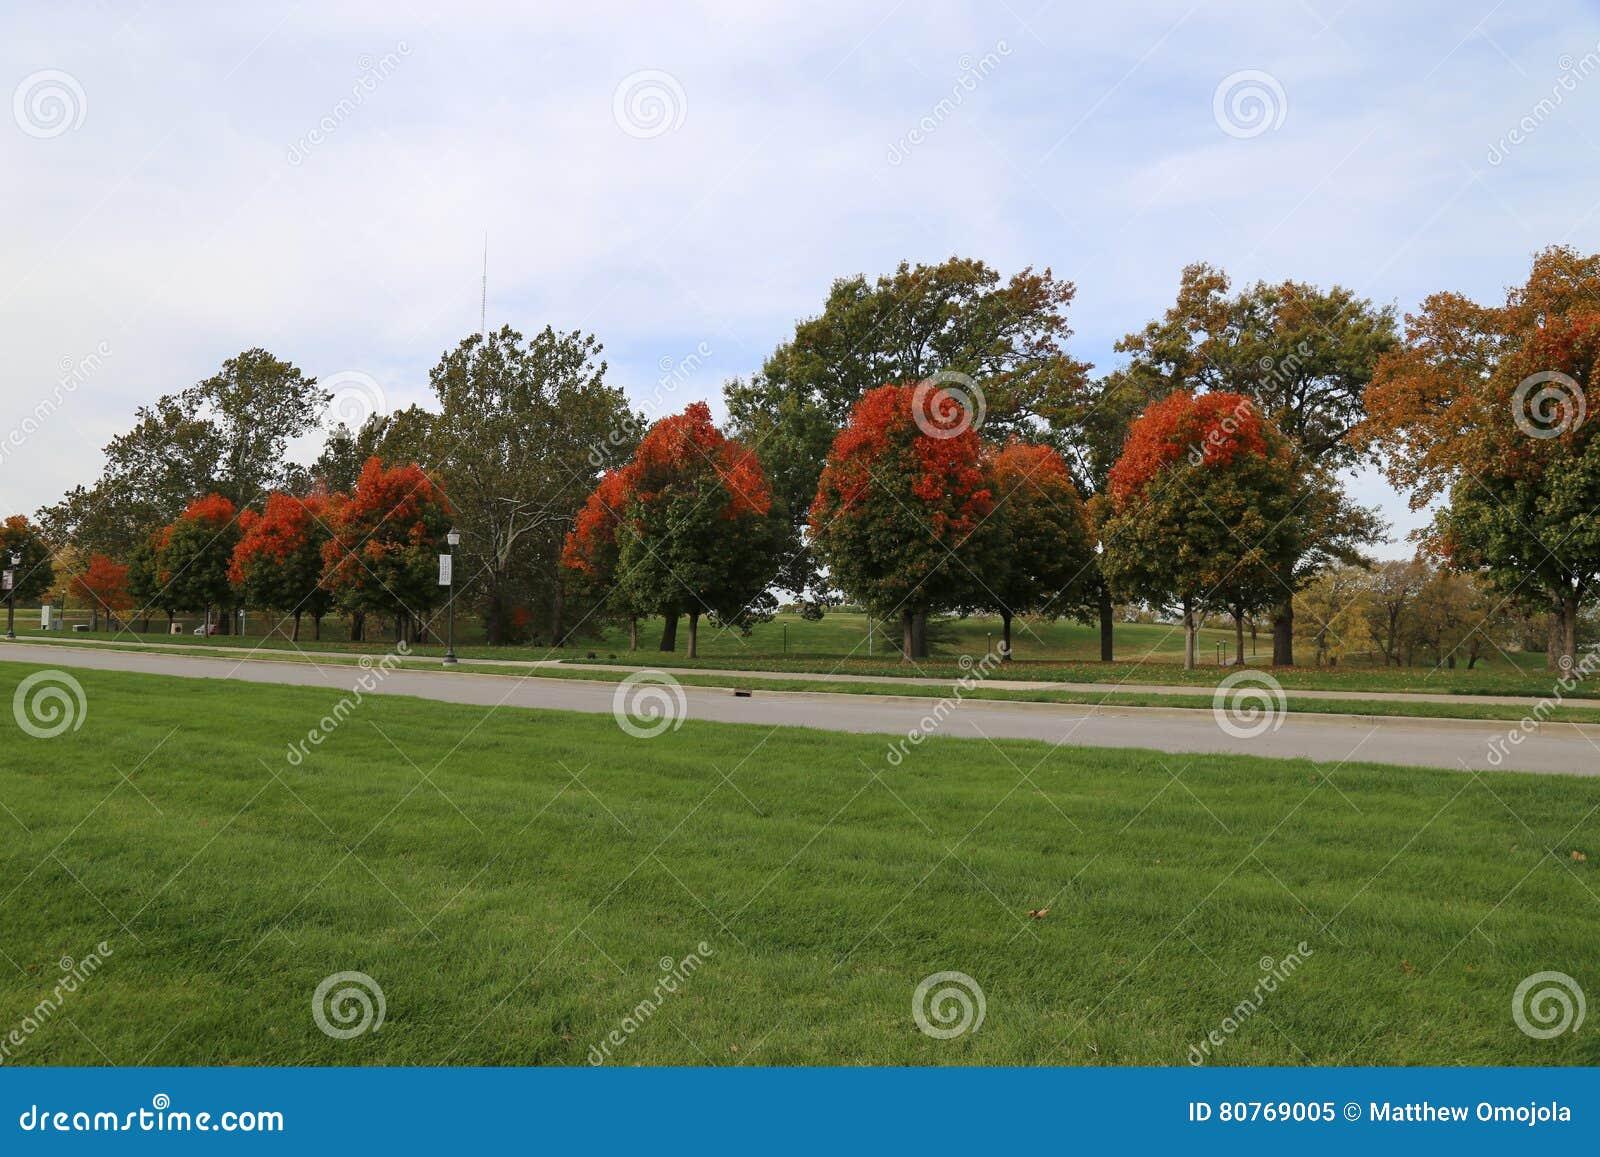 Rows Of Sugar Maple Trees In Kansas City Stock Photo Image 80769005